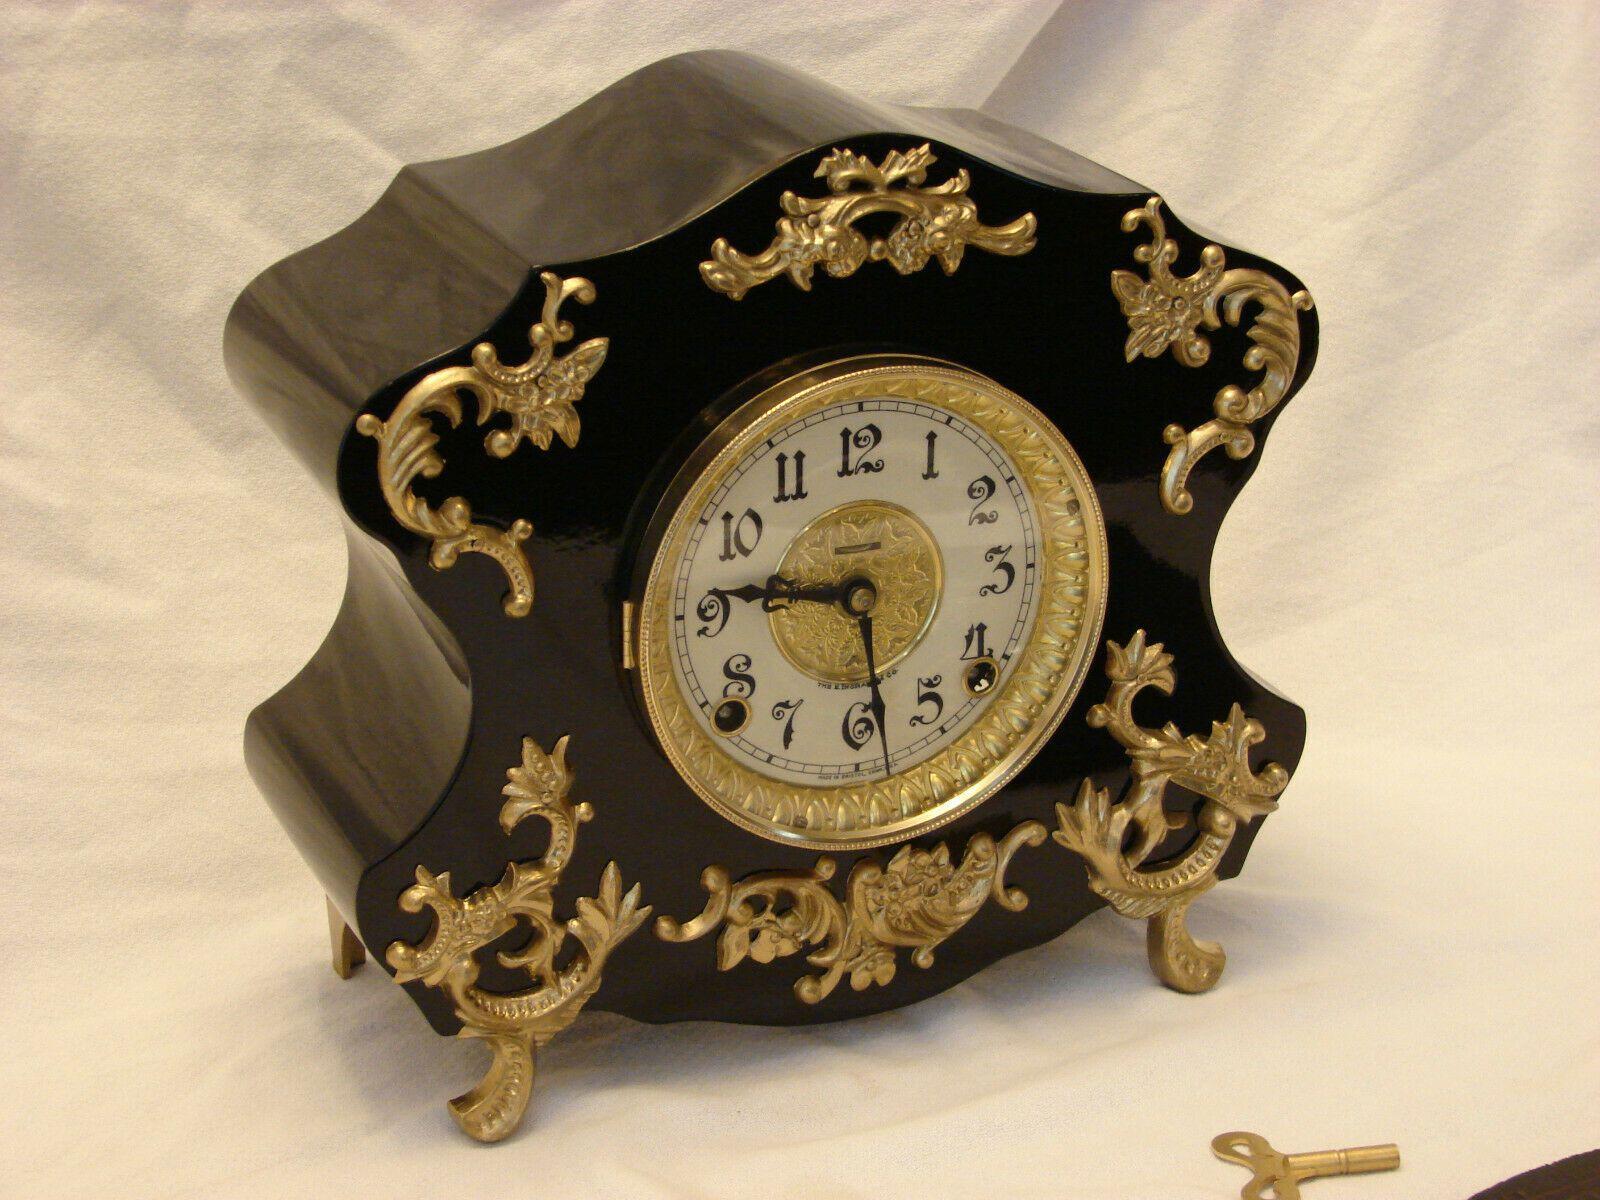 Restored Serviced Ingraham Black Mantel Clock Circa 1897 Antique Ideas Of Antique Clock Antiqueclock In 2020 Black Mantel Clocks Clock Antique Clock